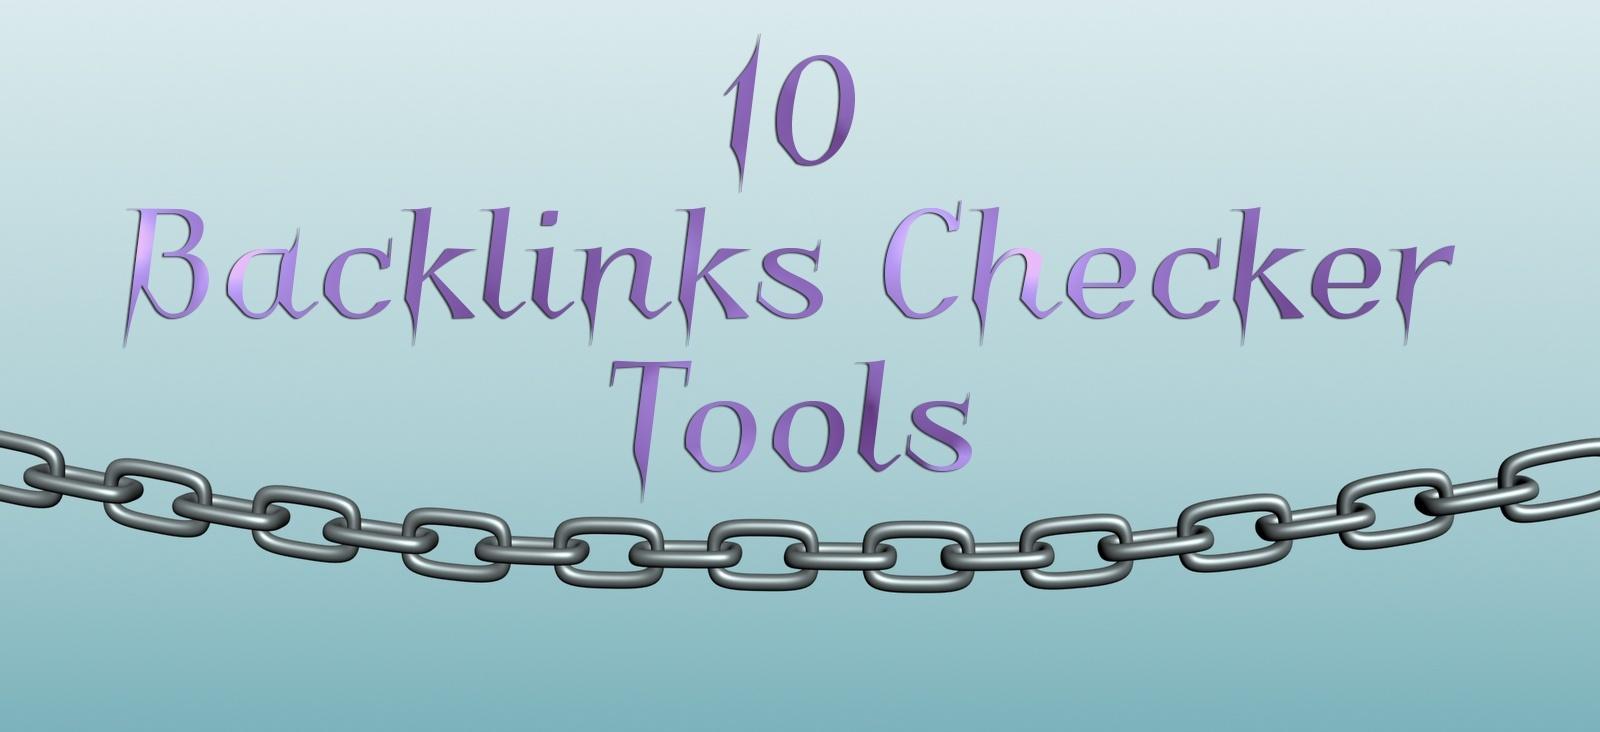 10-Backlinks-Checker-Tools